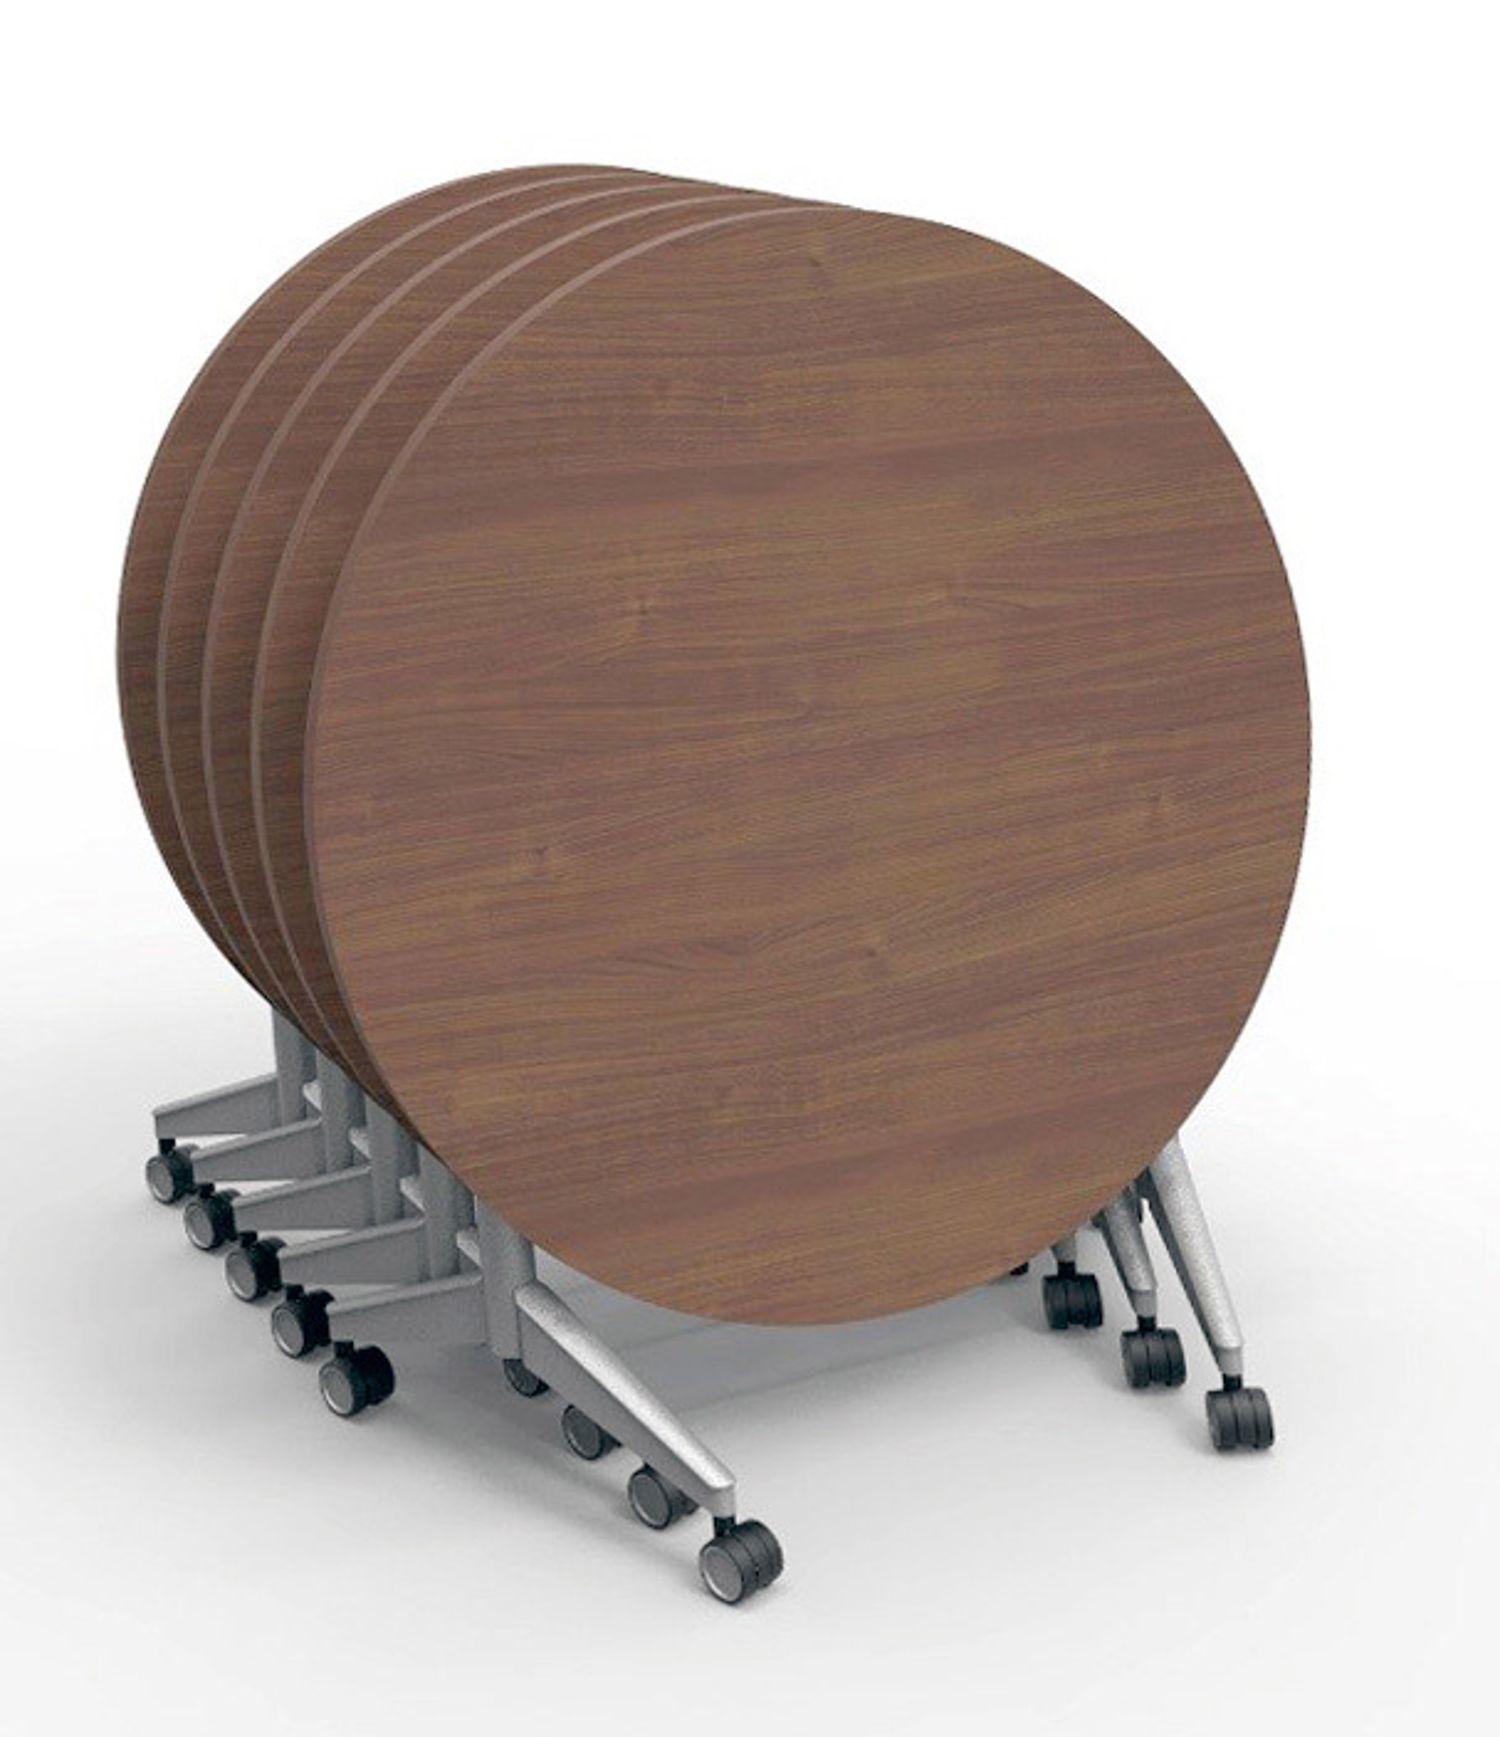 ki pirouette round nesting tables